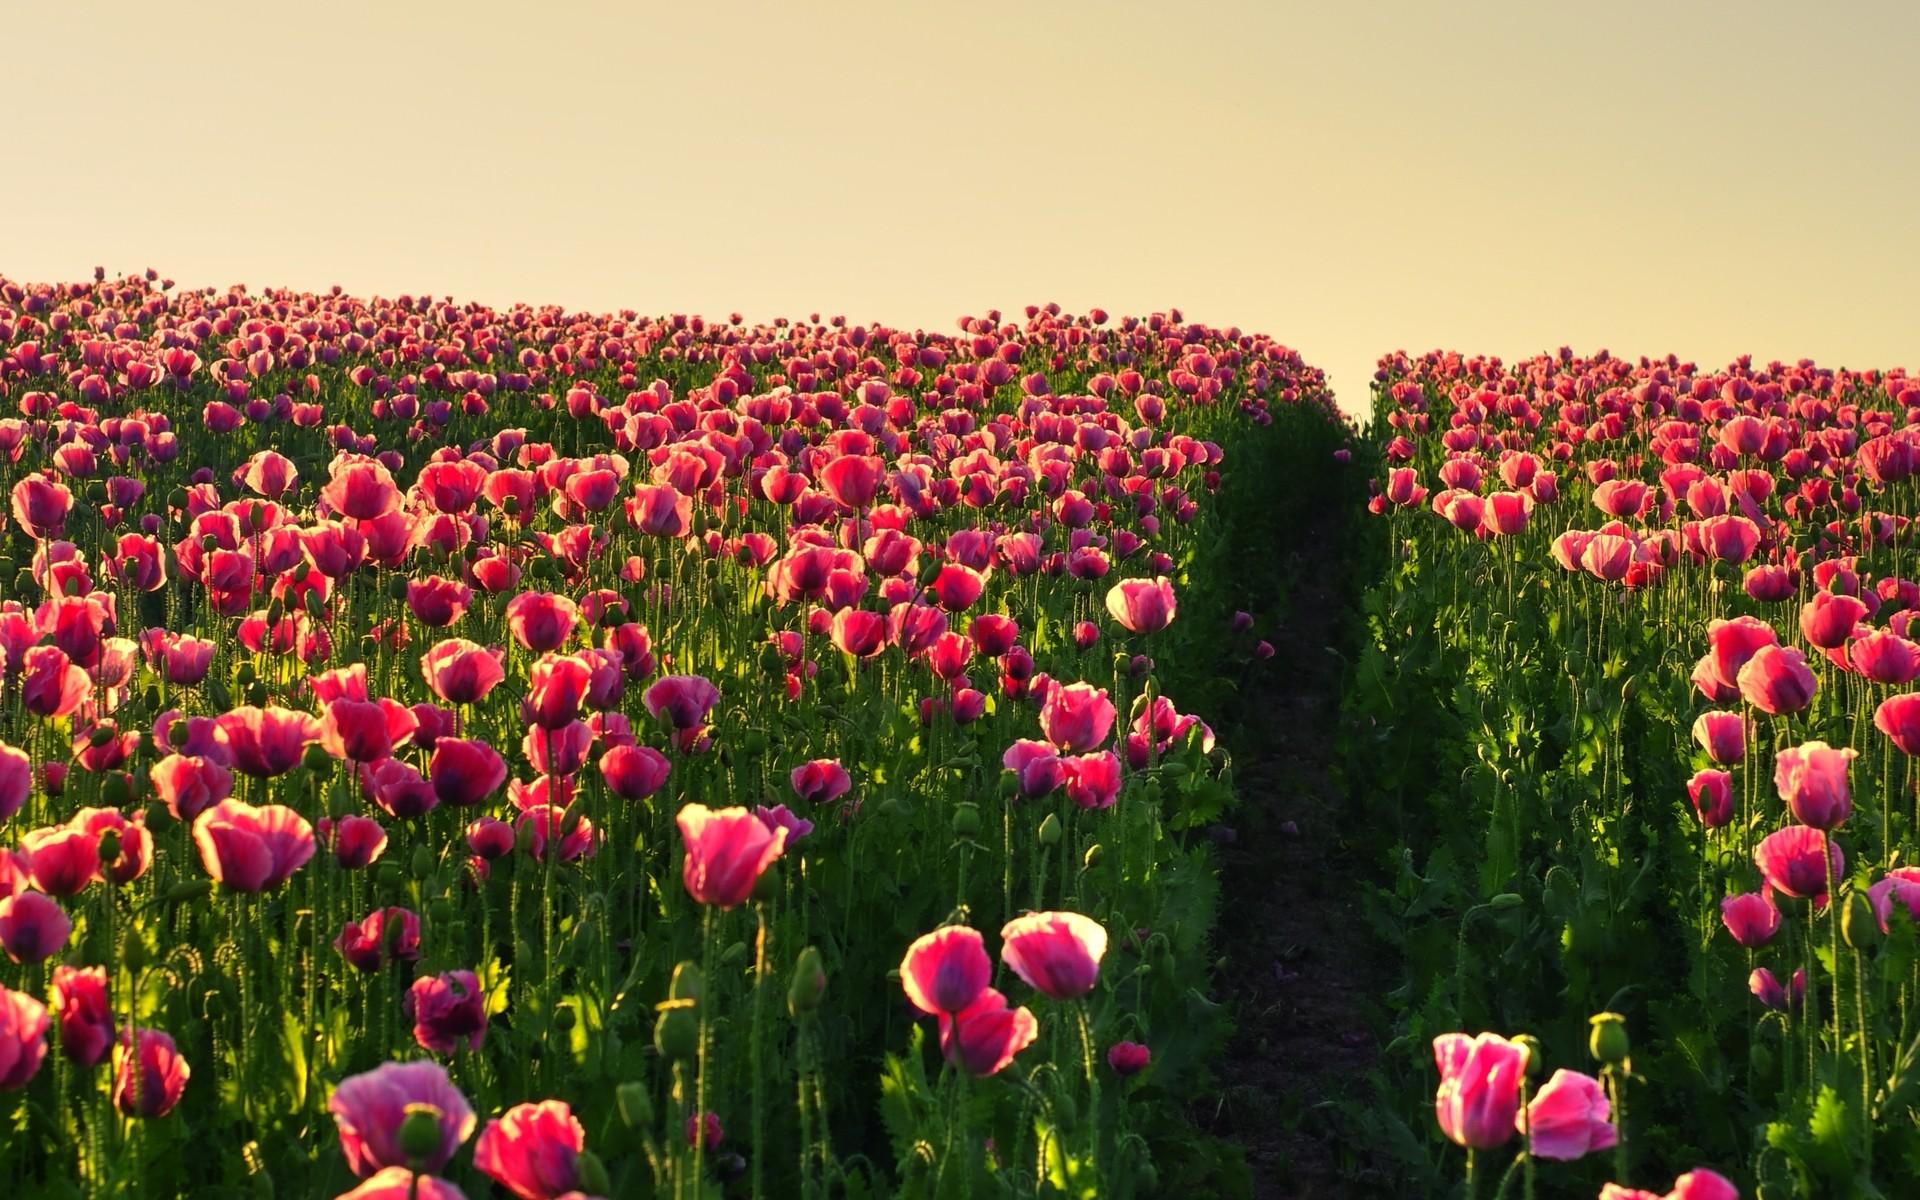 Gorgeous Flower Field Wallpaper